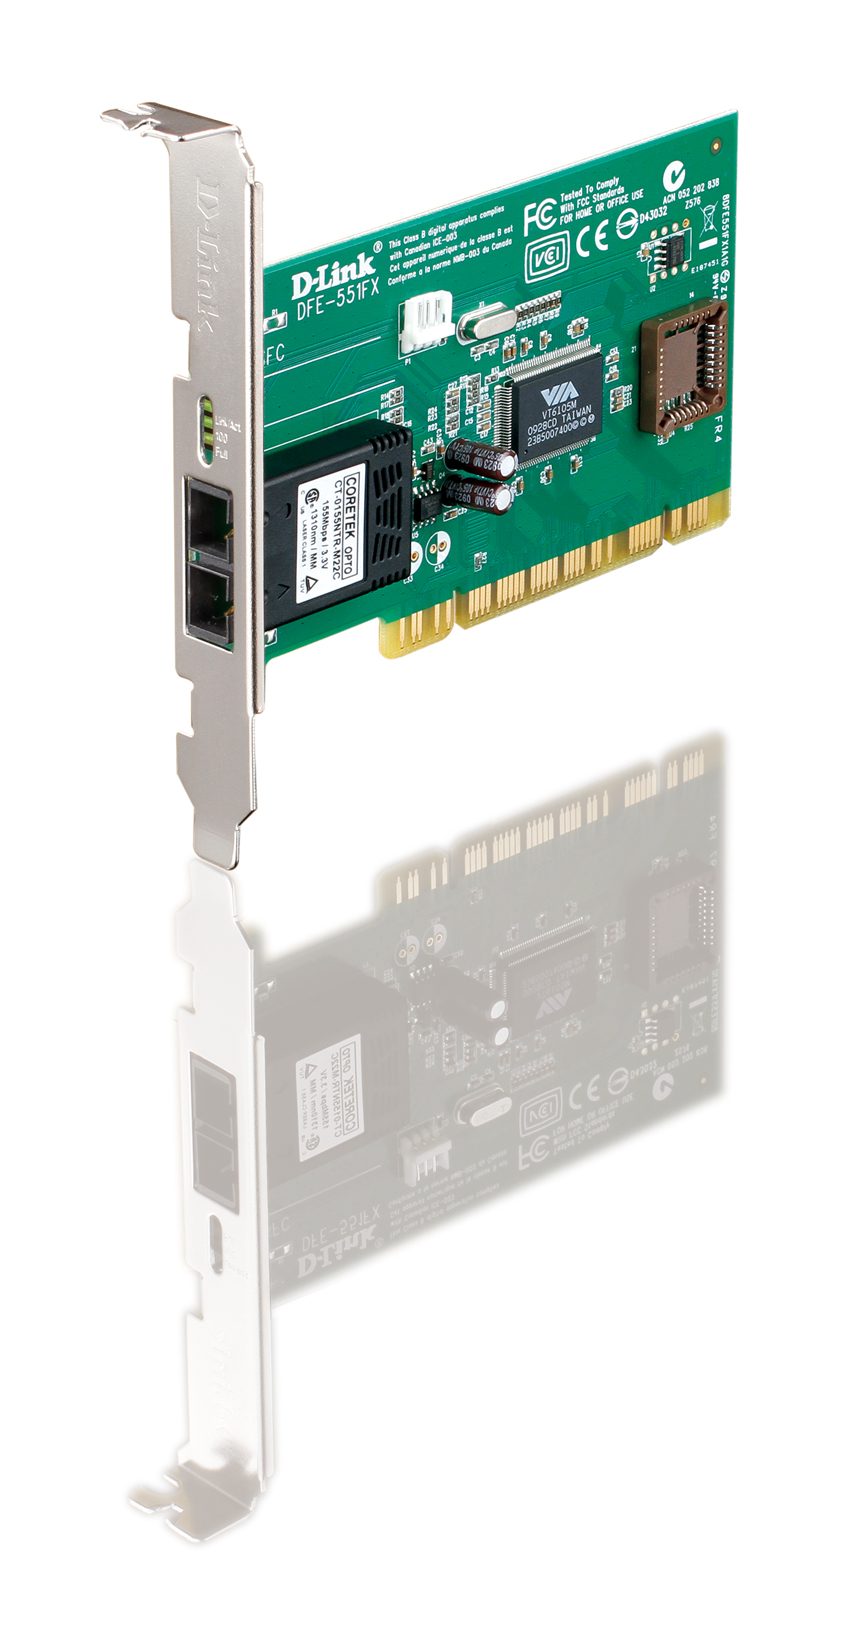 D-LINK DFE-551FX Optical Fiber Fast Ethernet LAN Network Adapter PCI Card FIBER